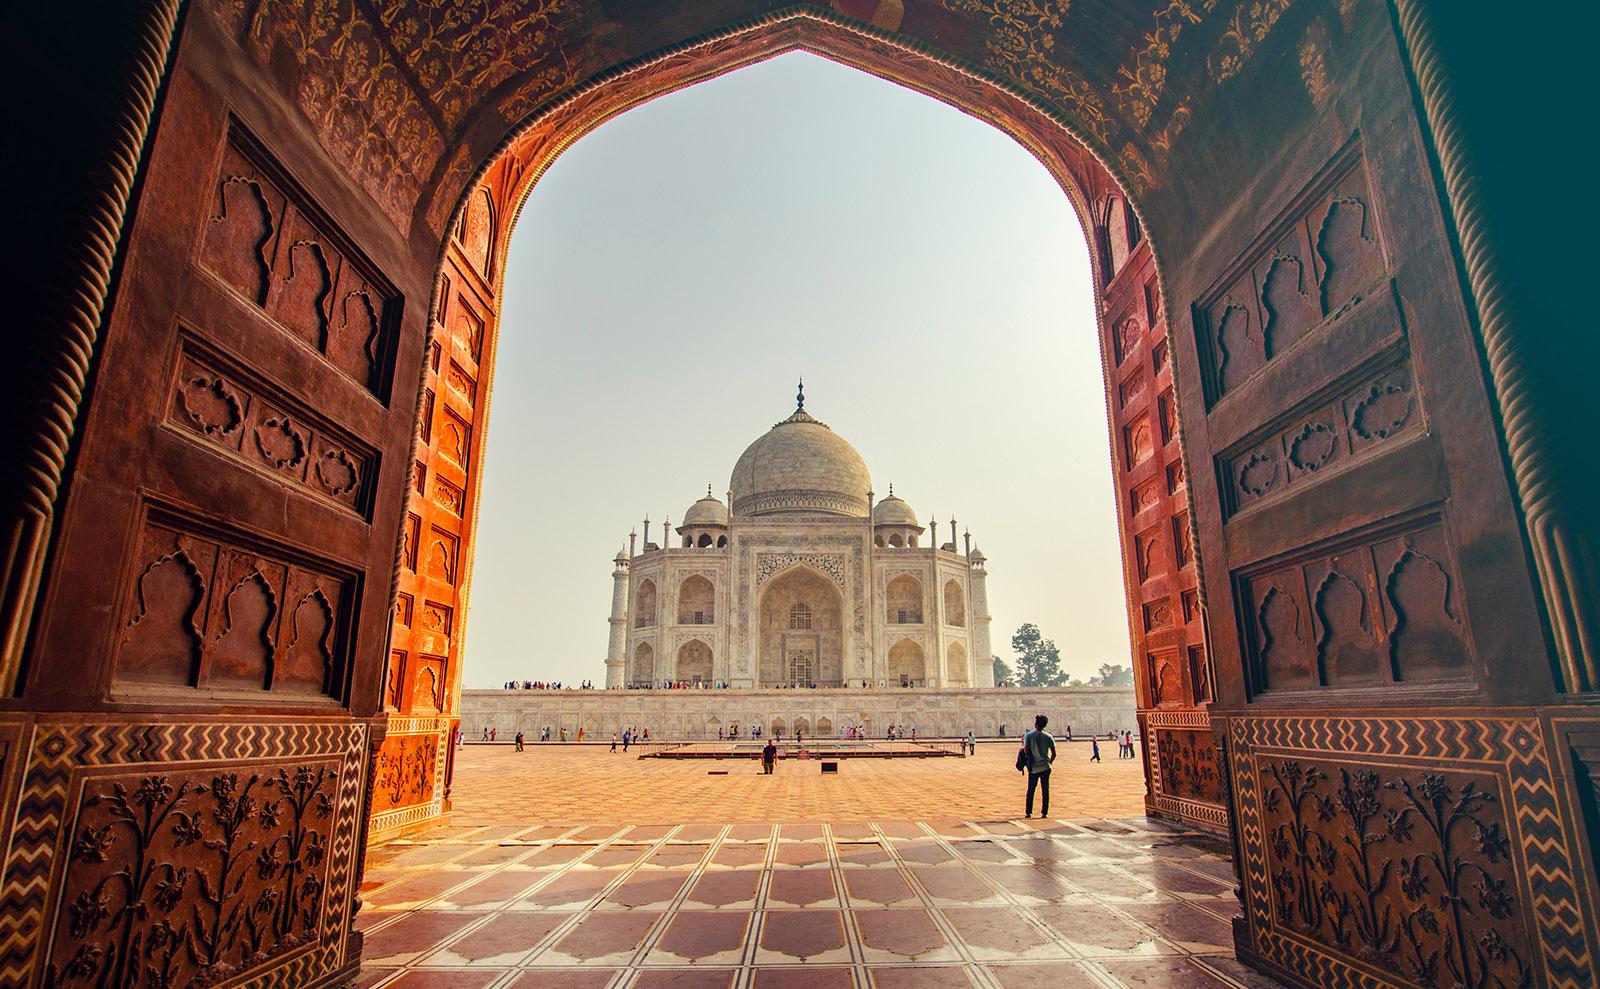 Taj Mahal, Wild Thing Snow Monsters, Singapore Street Food & More: Endnotes 05 February